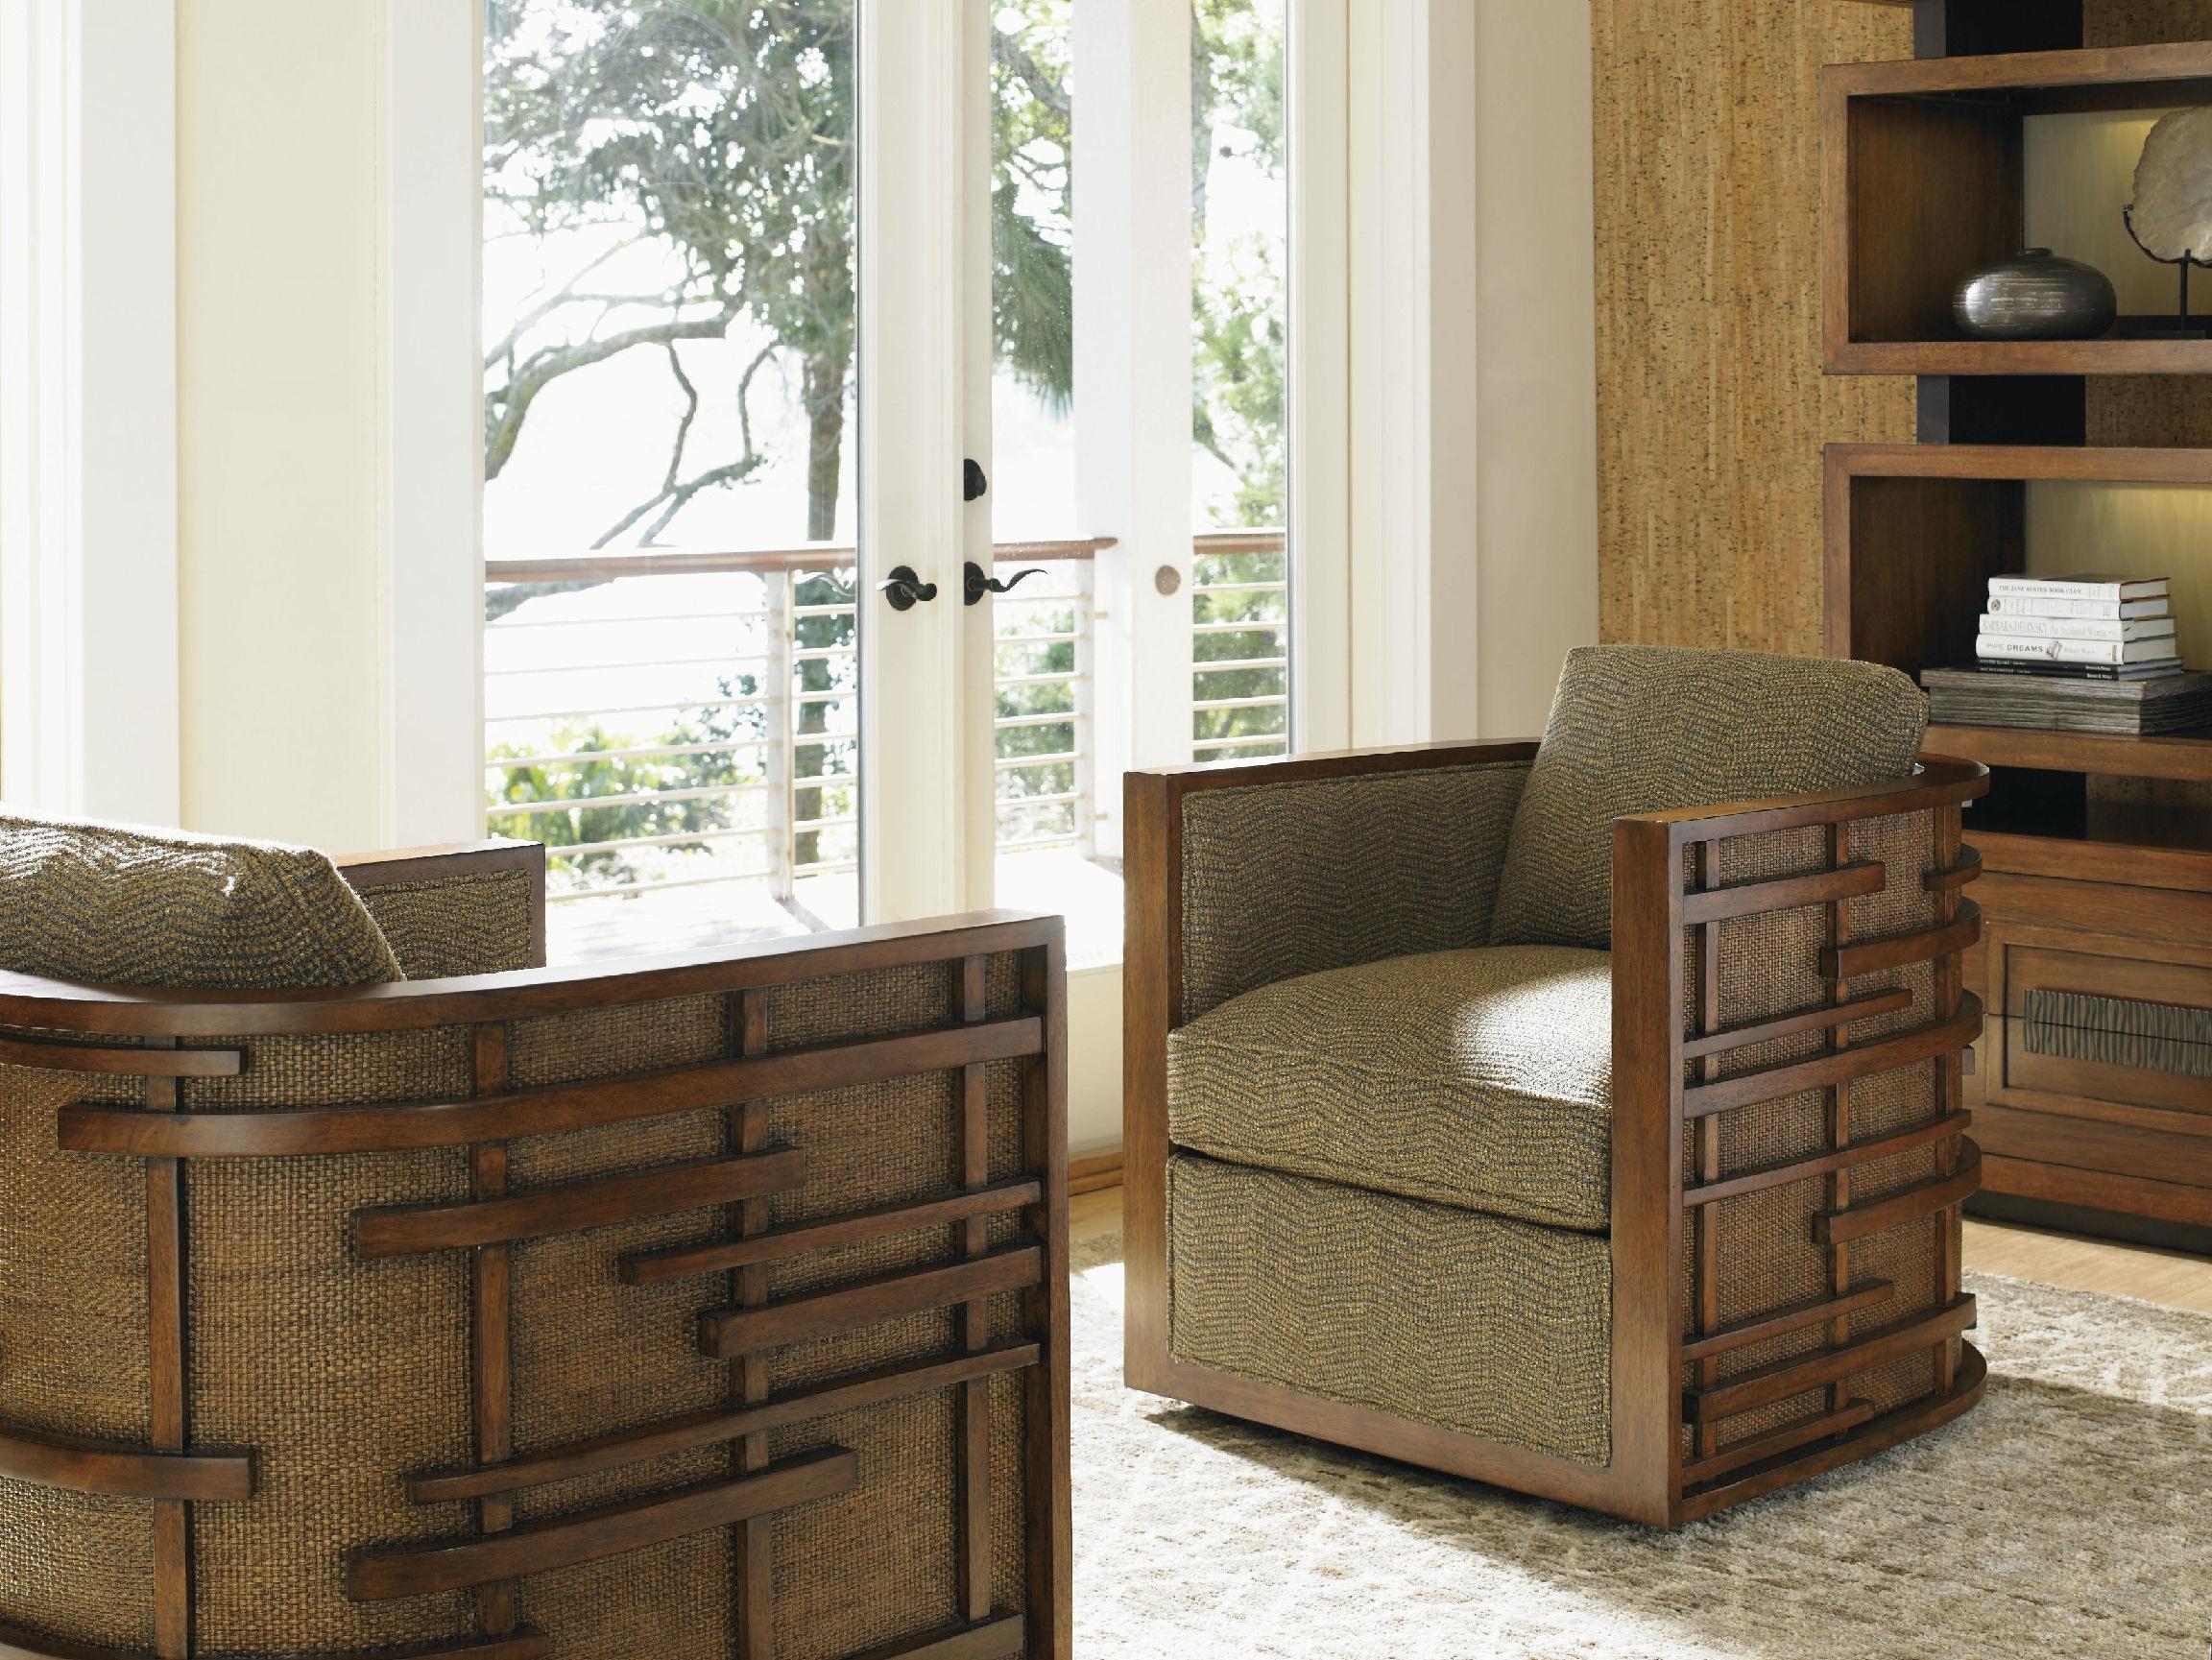 Tommy Bahama Home Living Room Semerang Swivel Chair 1763 11sw Habegger Furniture Inc Berne